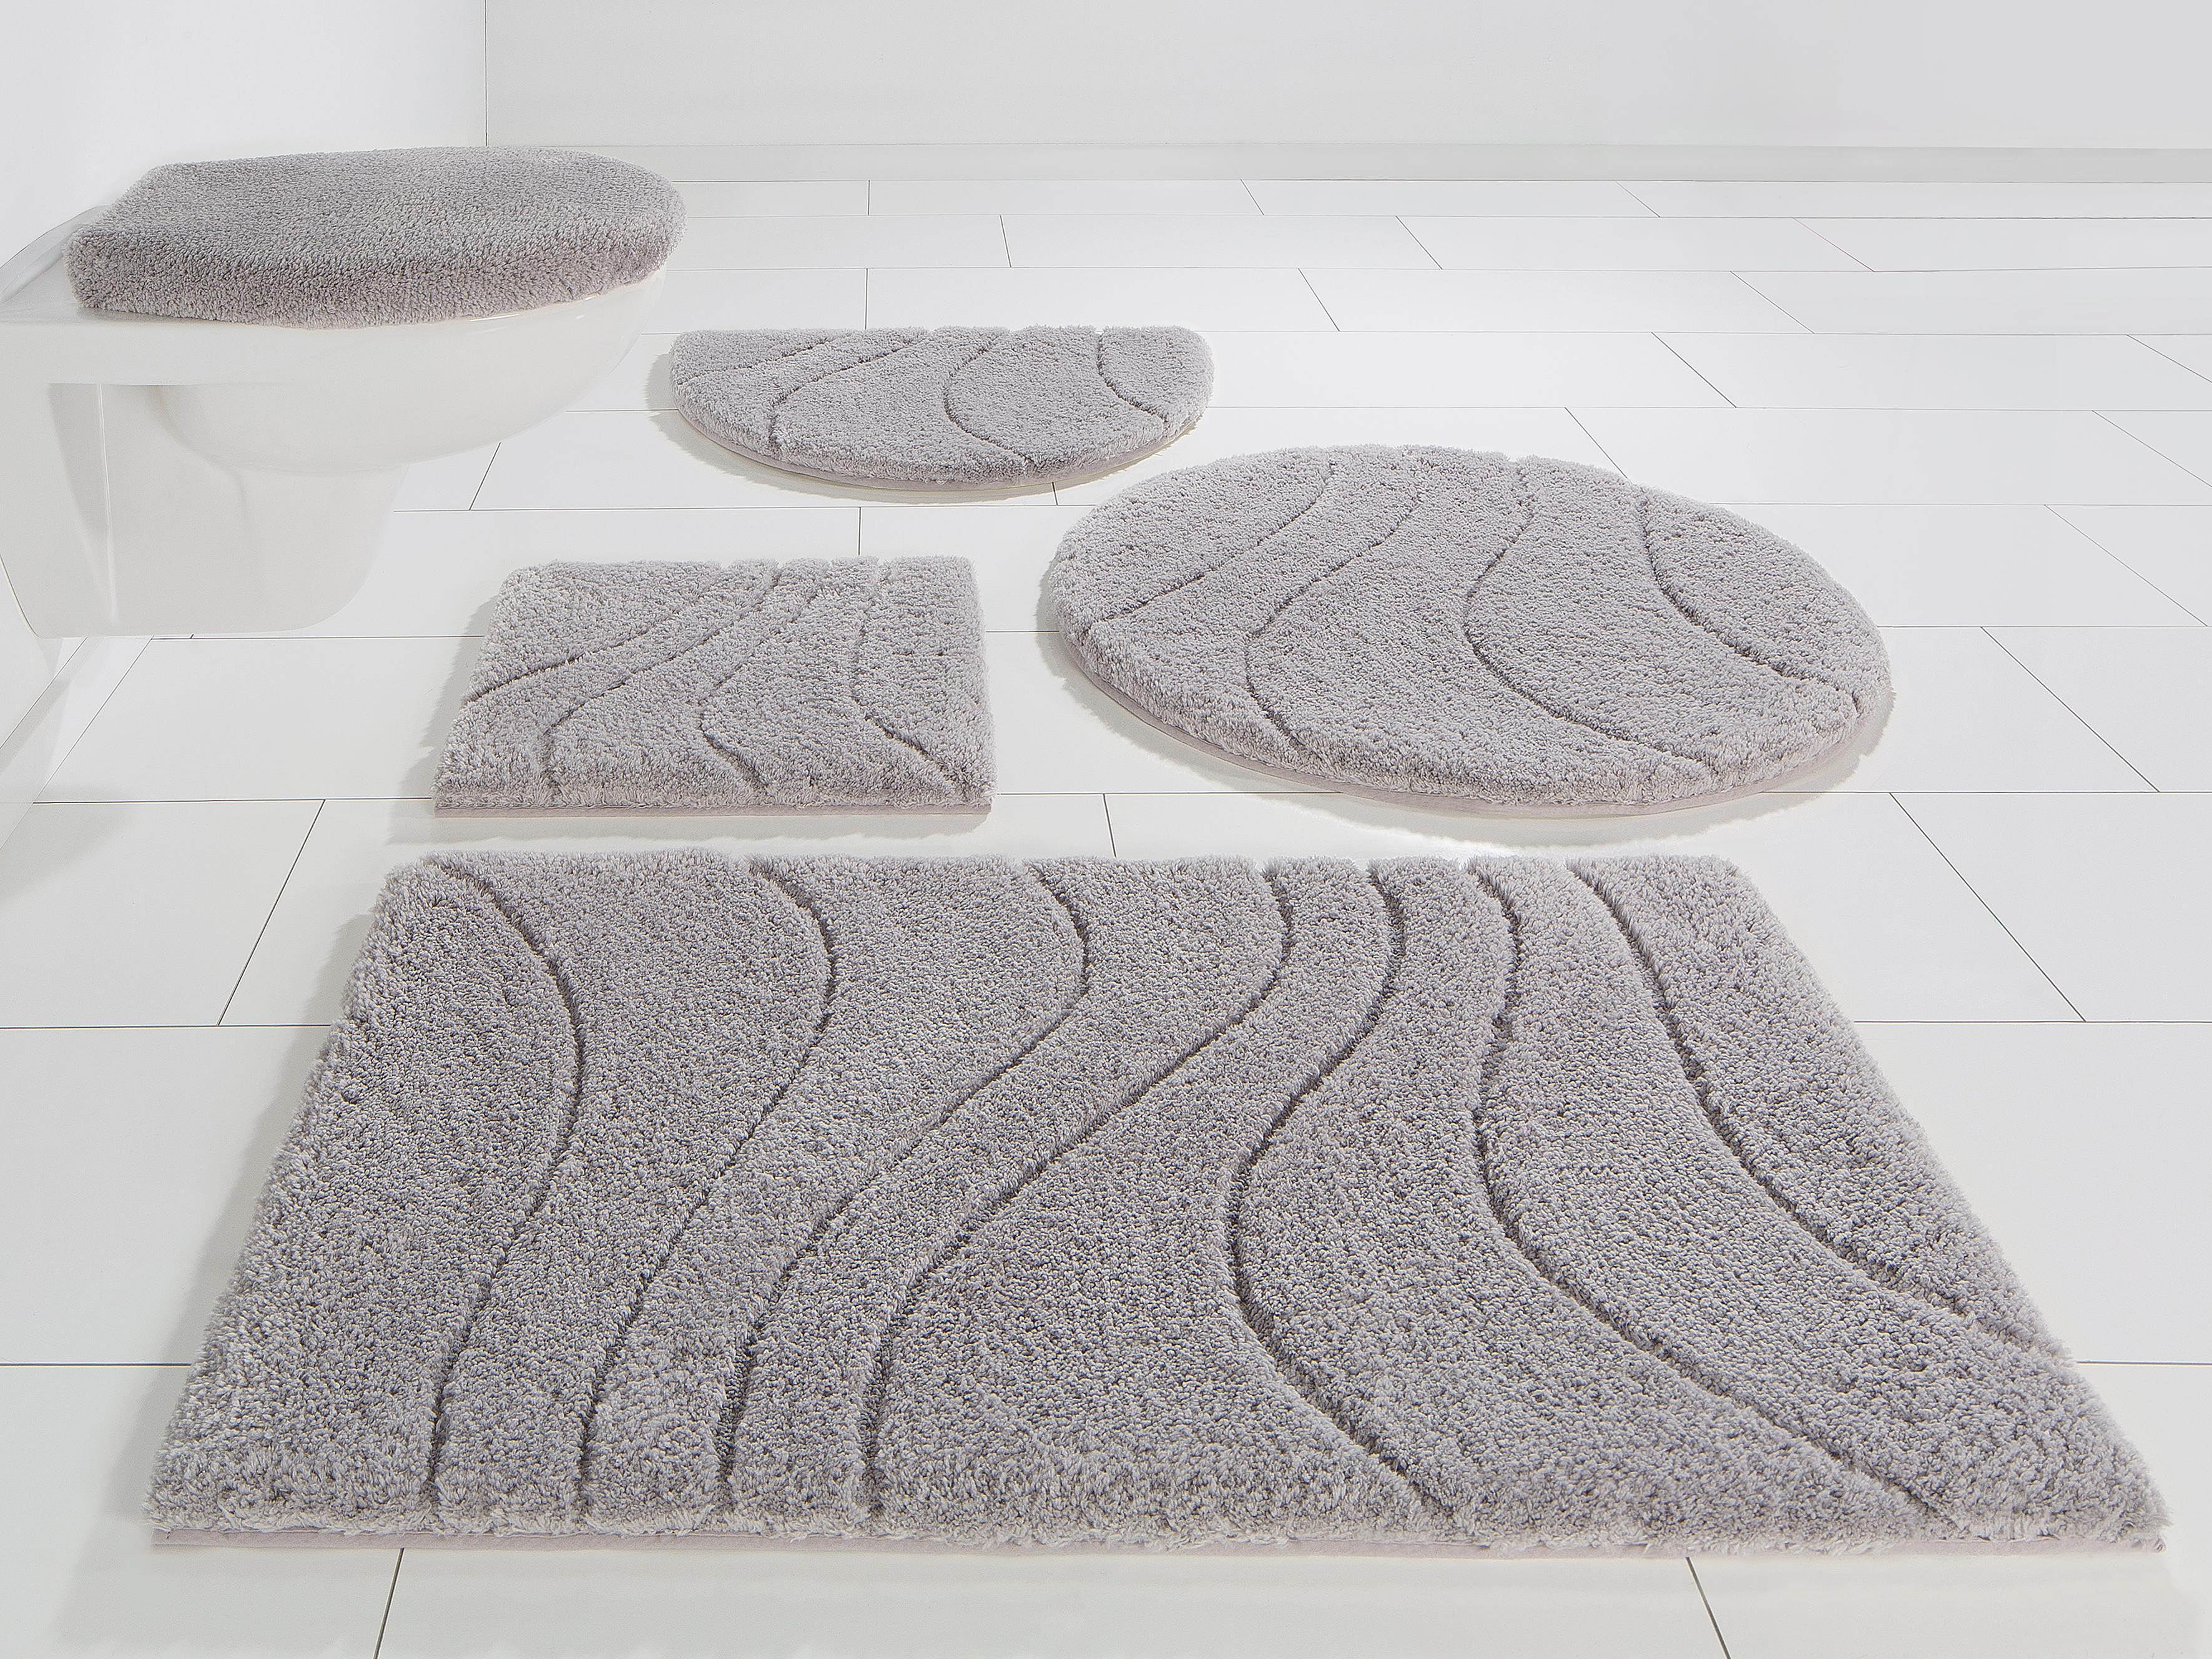 Image of Badematte »Lola«, Home affaire, Höhe 22 mm, rutschhemmend beschichtet, fussbodenheizungsgeeignet